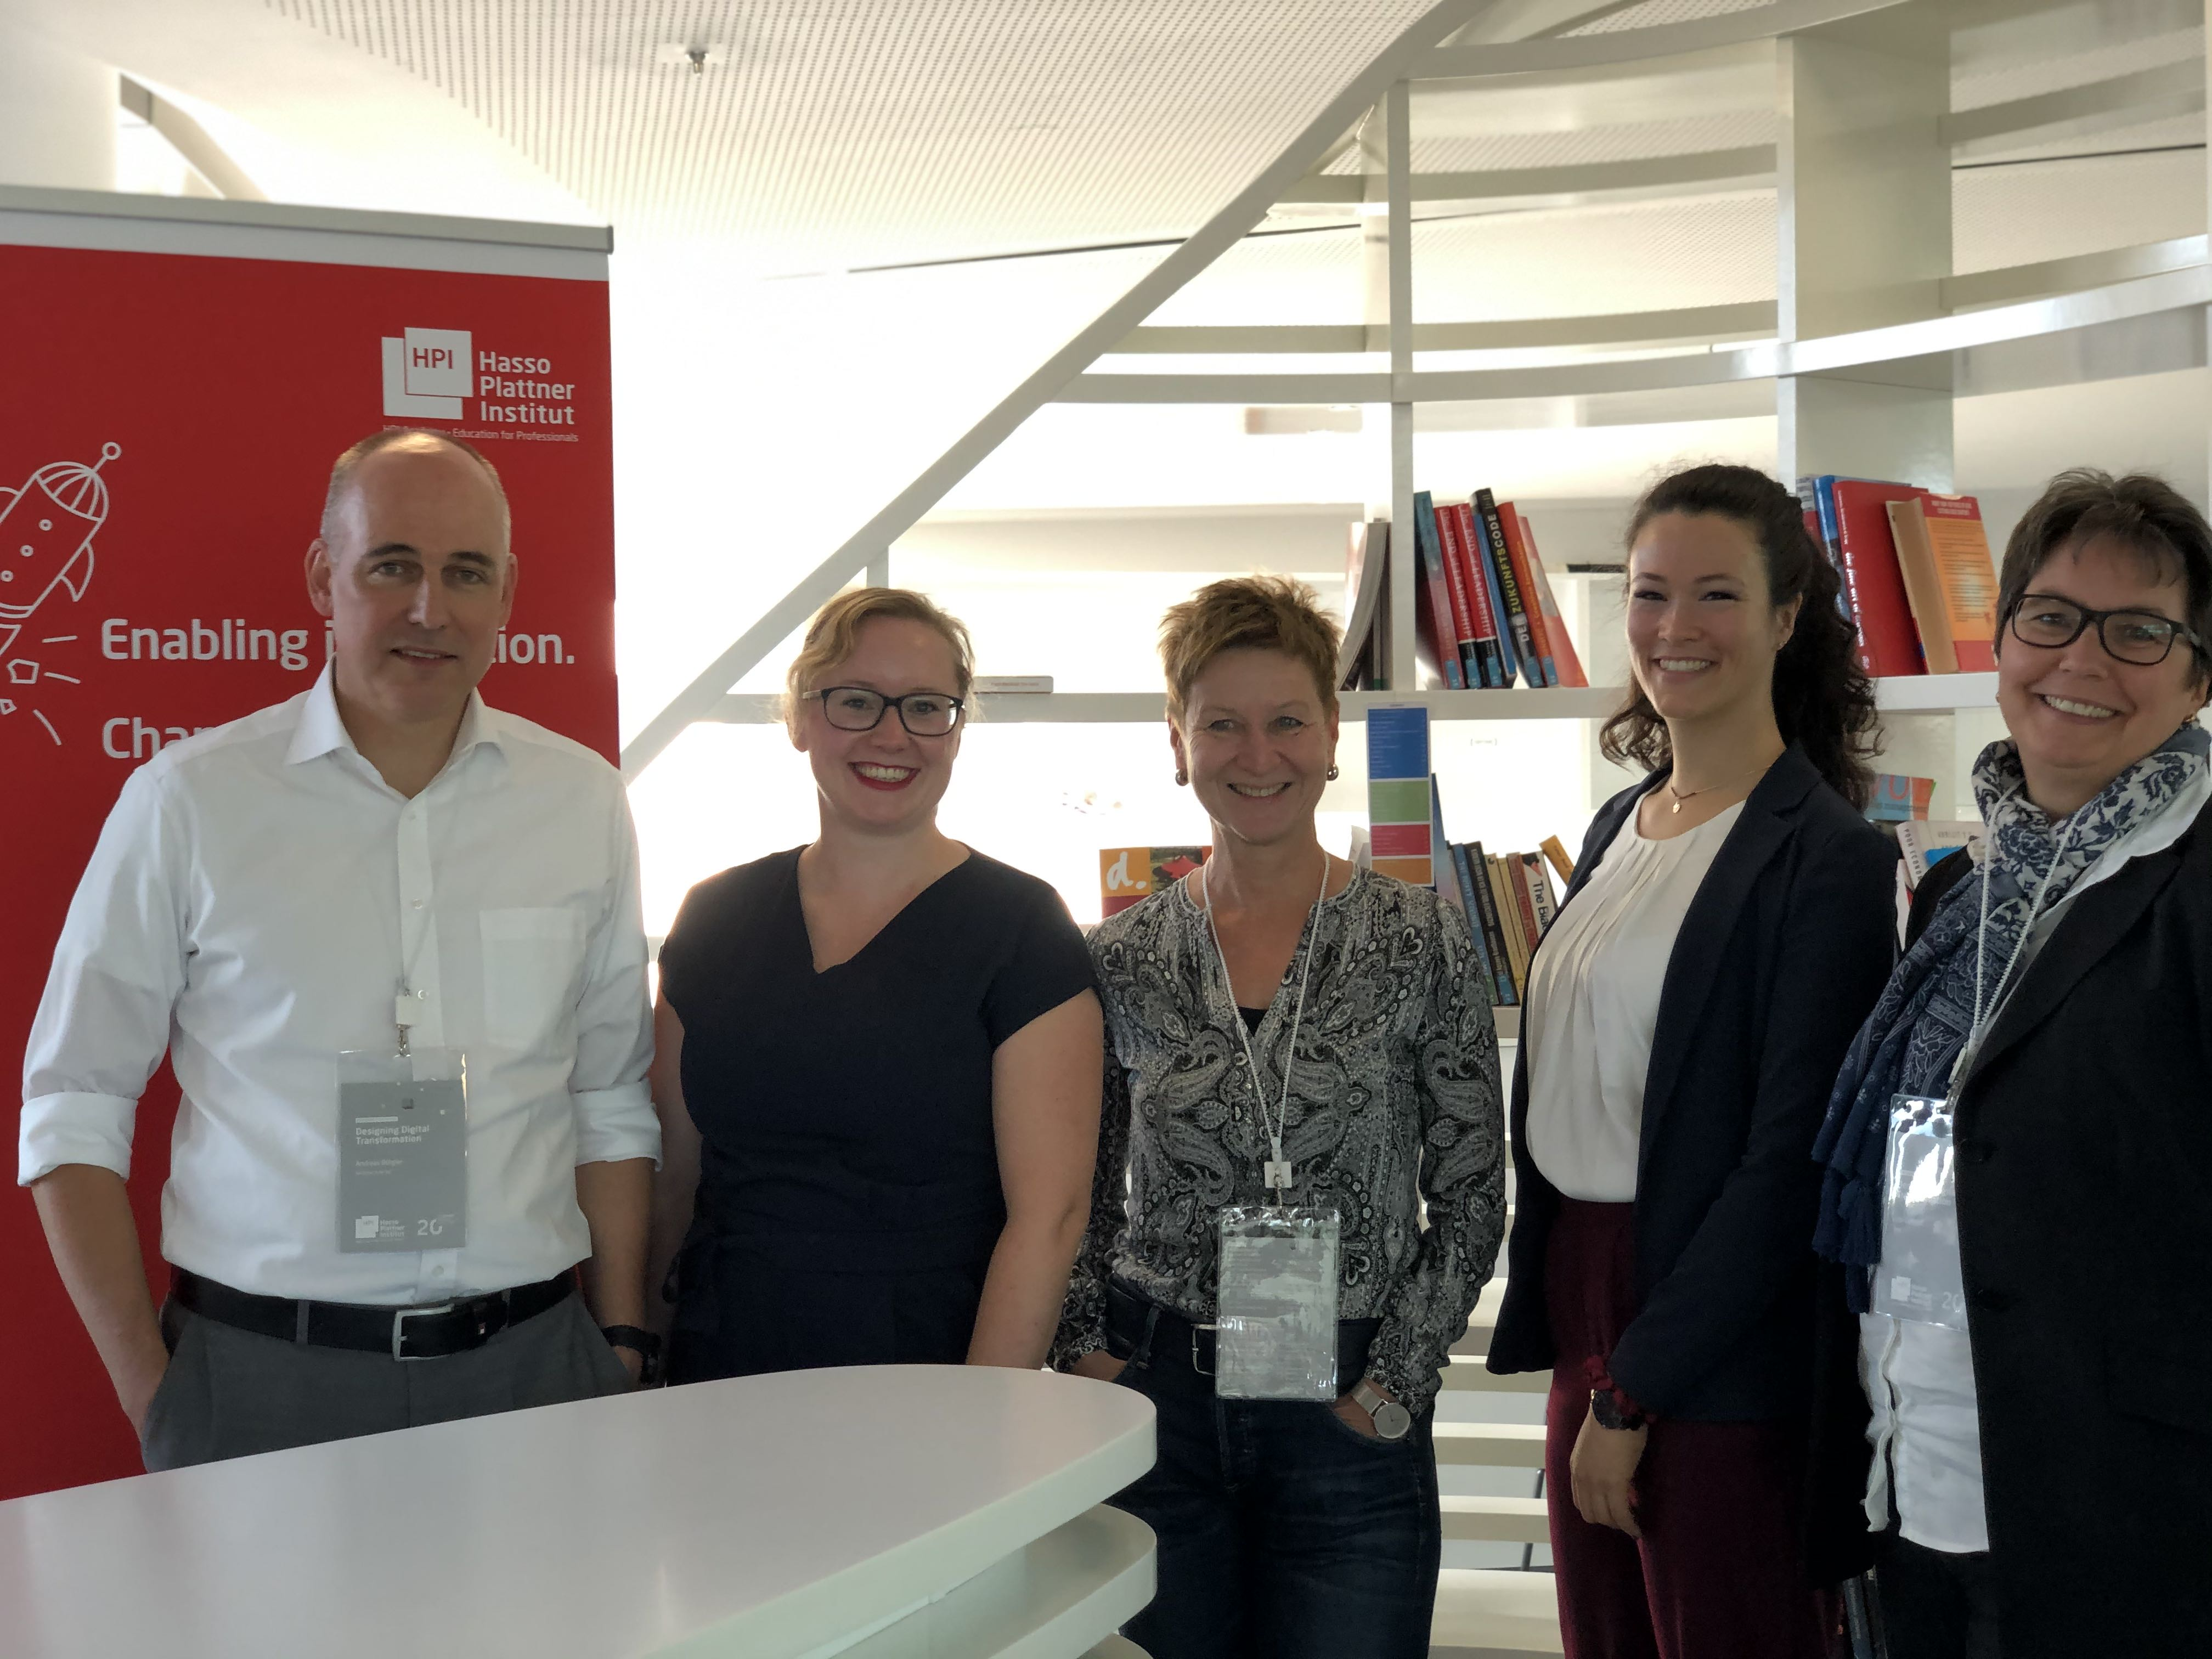 Andreas Bürgler (DB), Flavia Bleuel, Gabriele Schmidt (Pons), Selina Mayer, Ute Conradi (UCB) photo credit: Franziska Reich